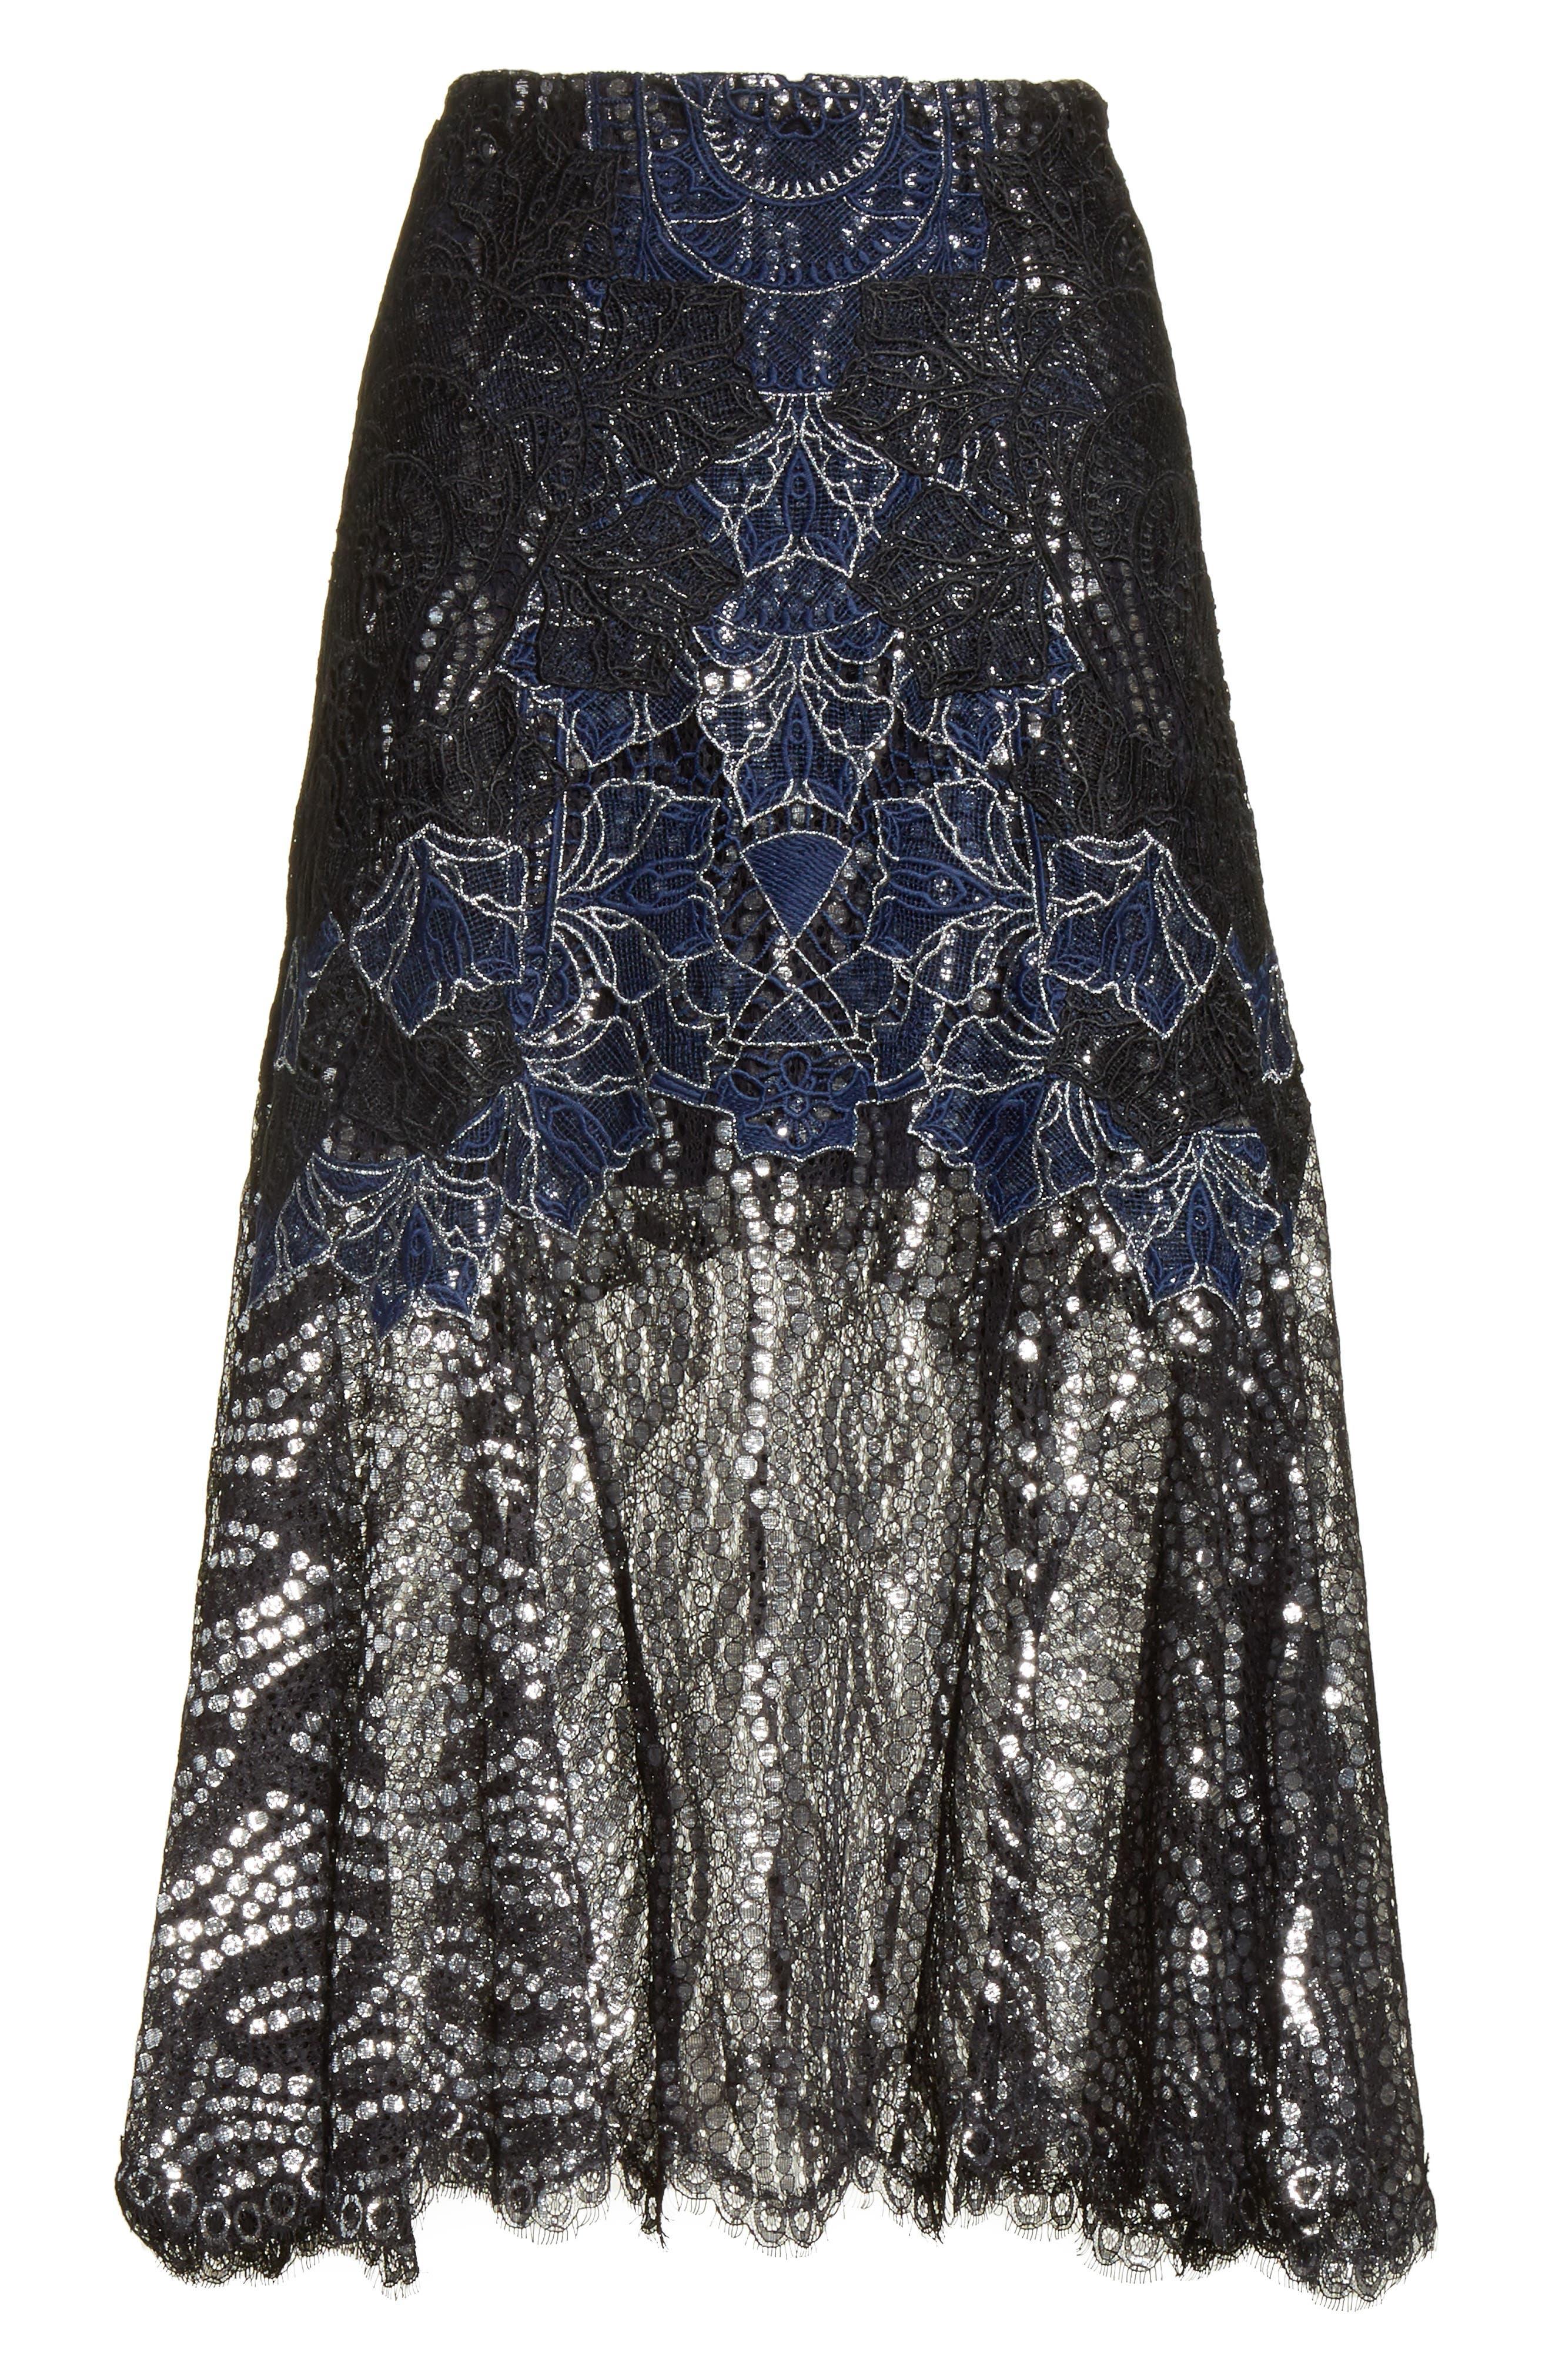 Dimensional Metallic Appliqué Trumpet Skirt,                             Alternate thumbnail 6, color,                             Black